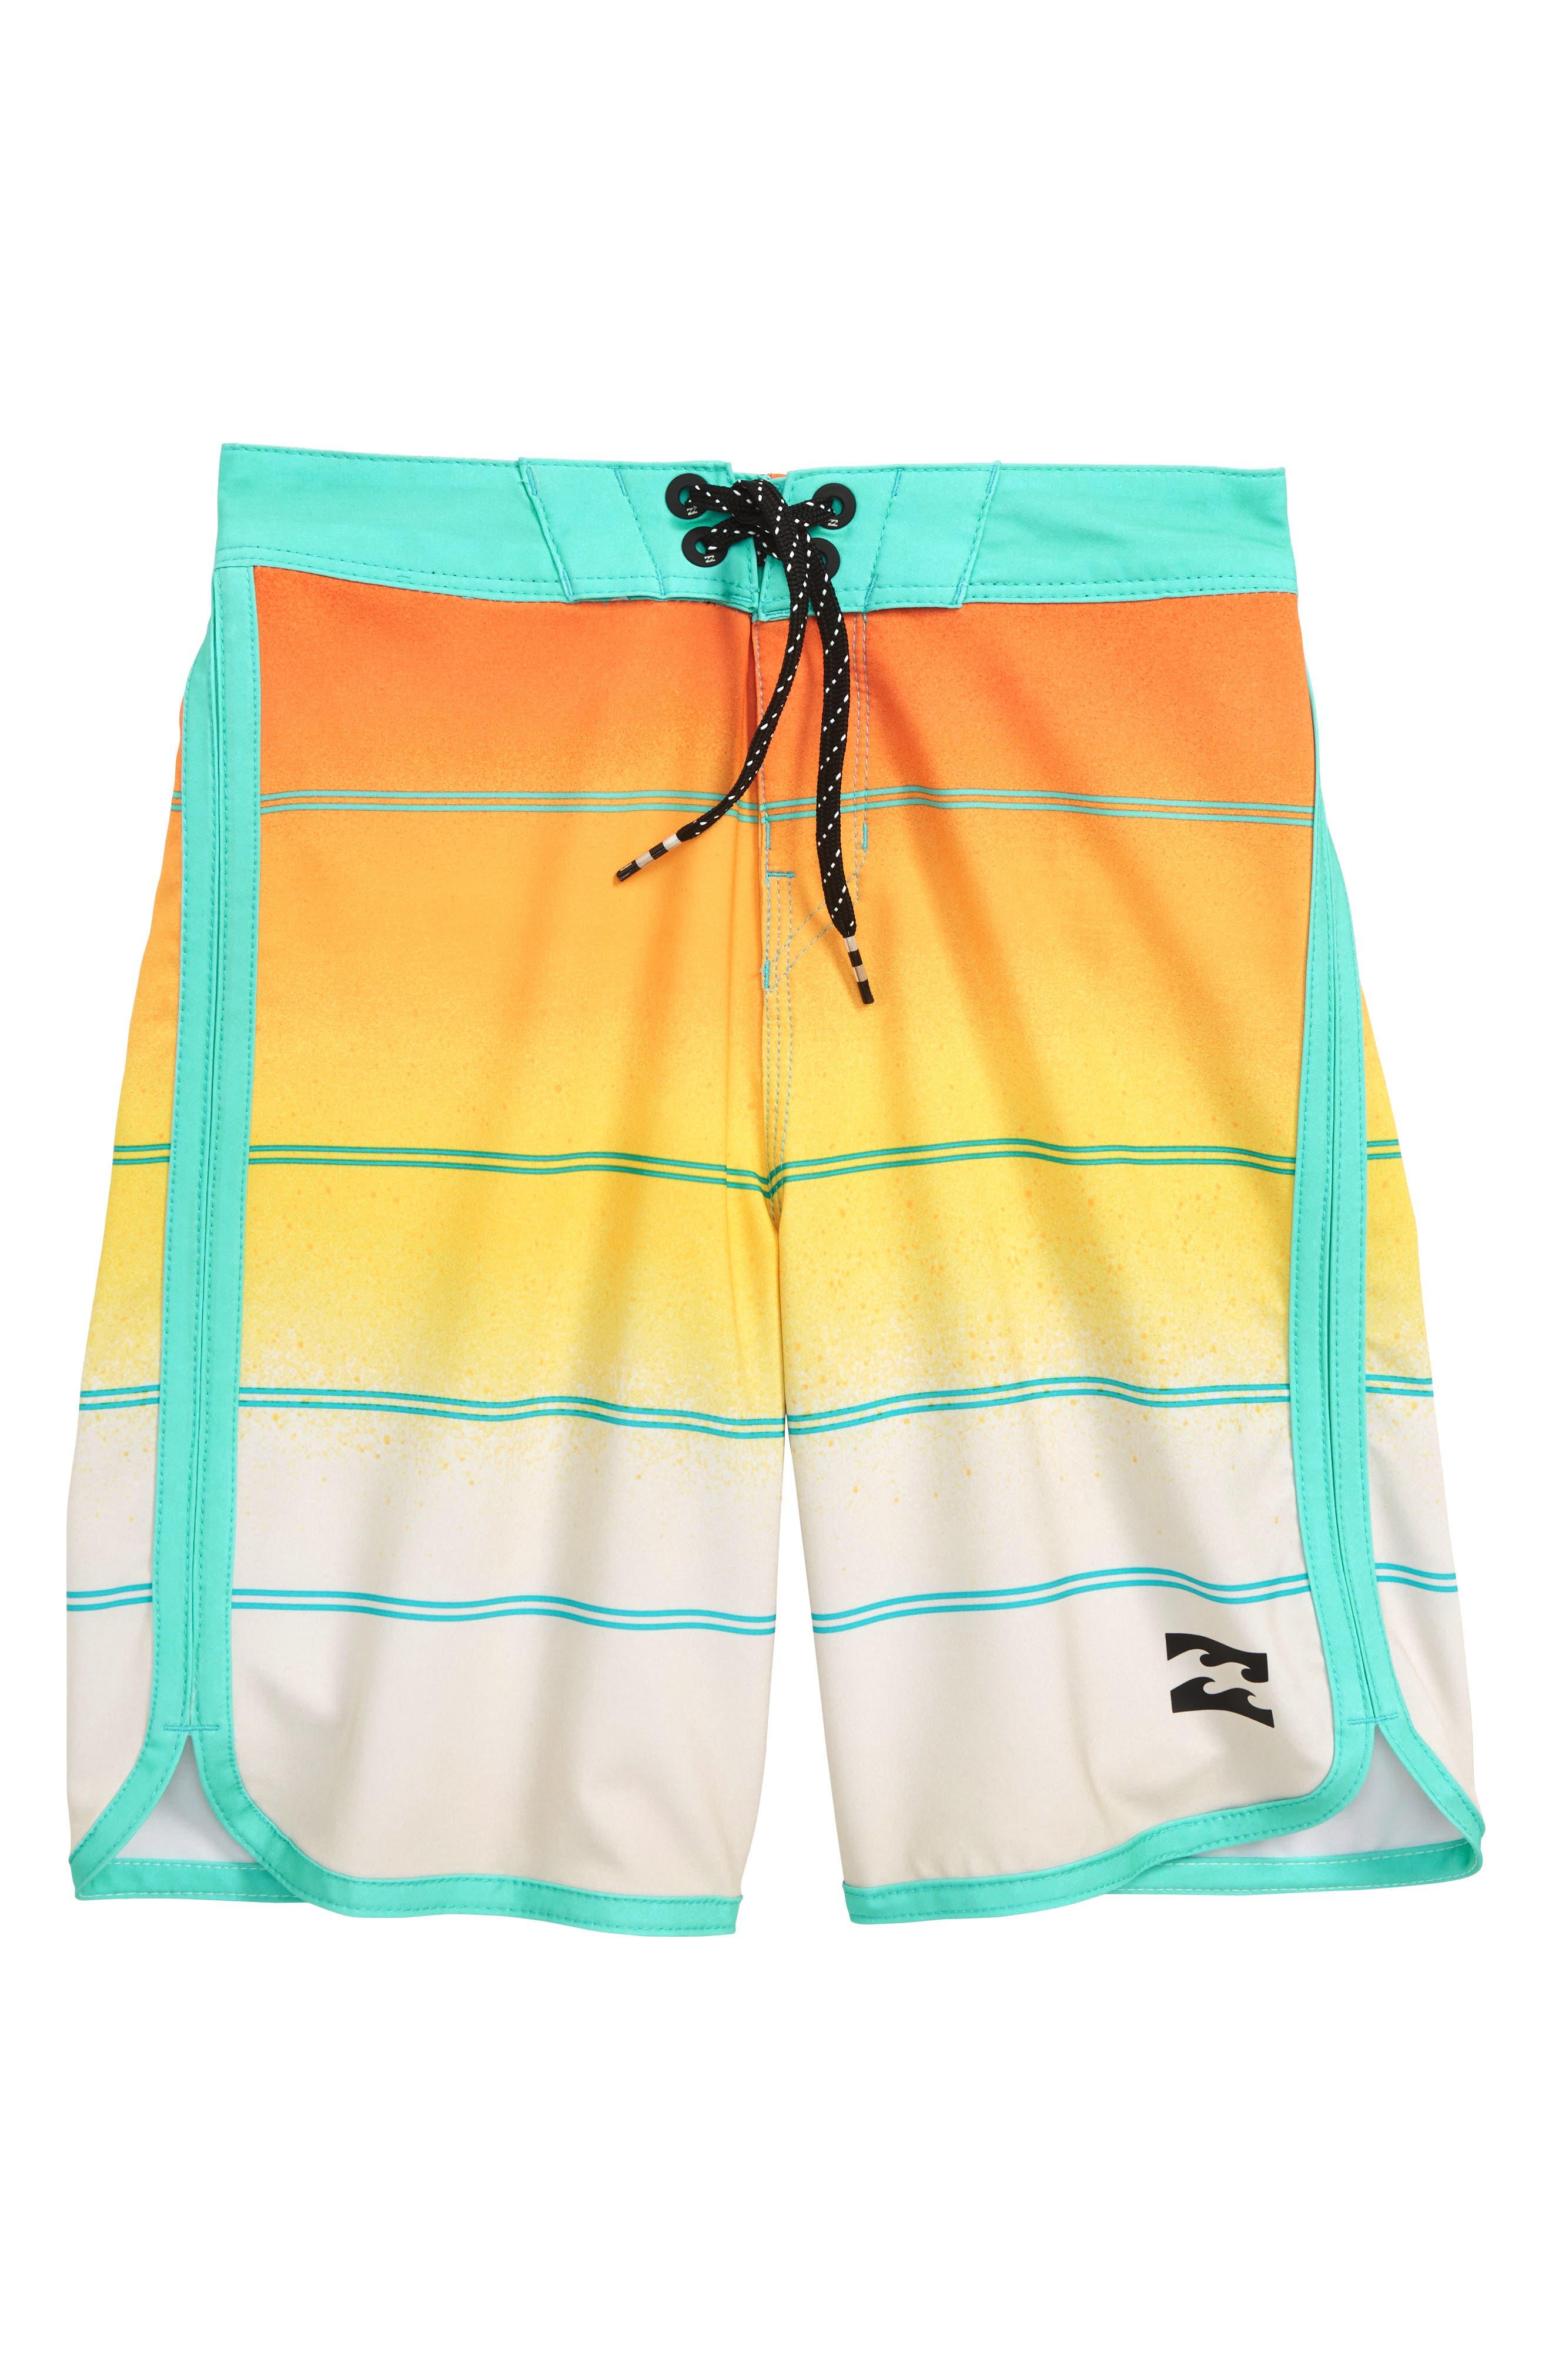 73 X Stripe Board Shorts,                         Main,                         color, Yellow